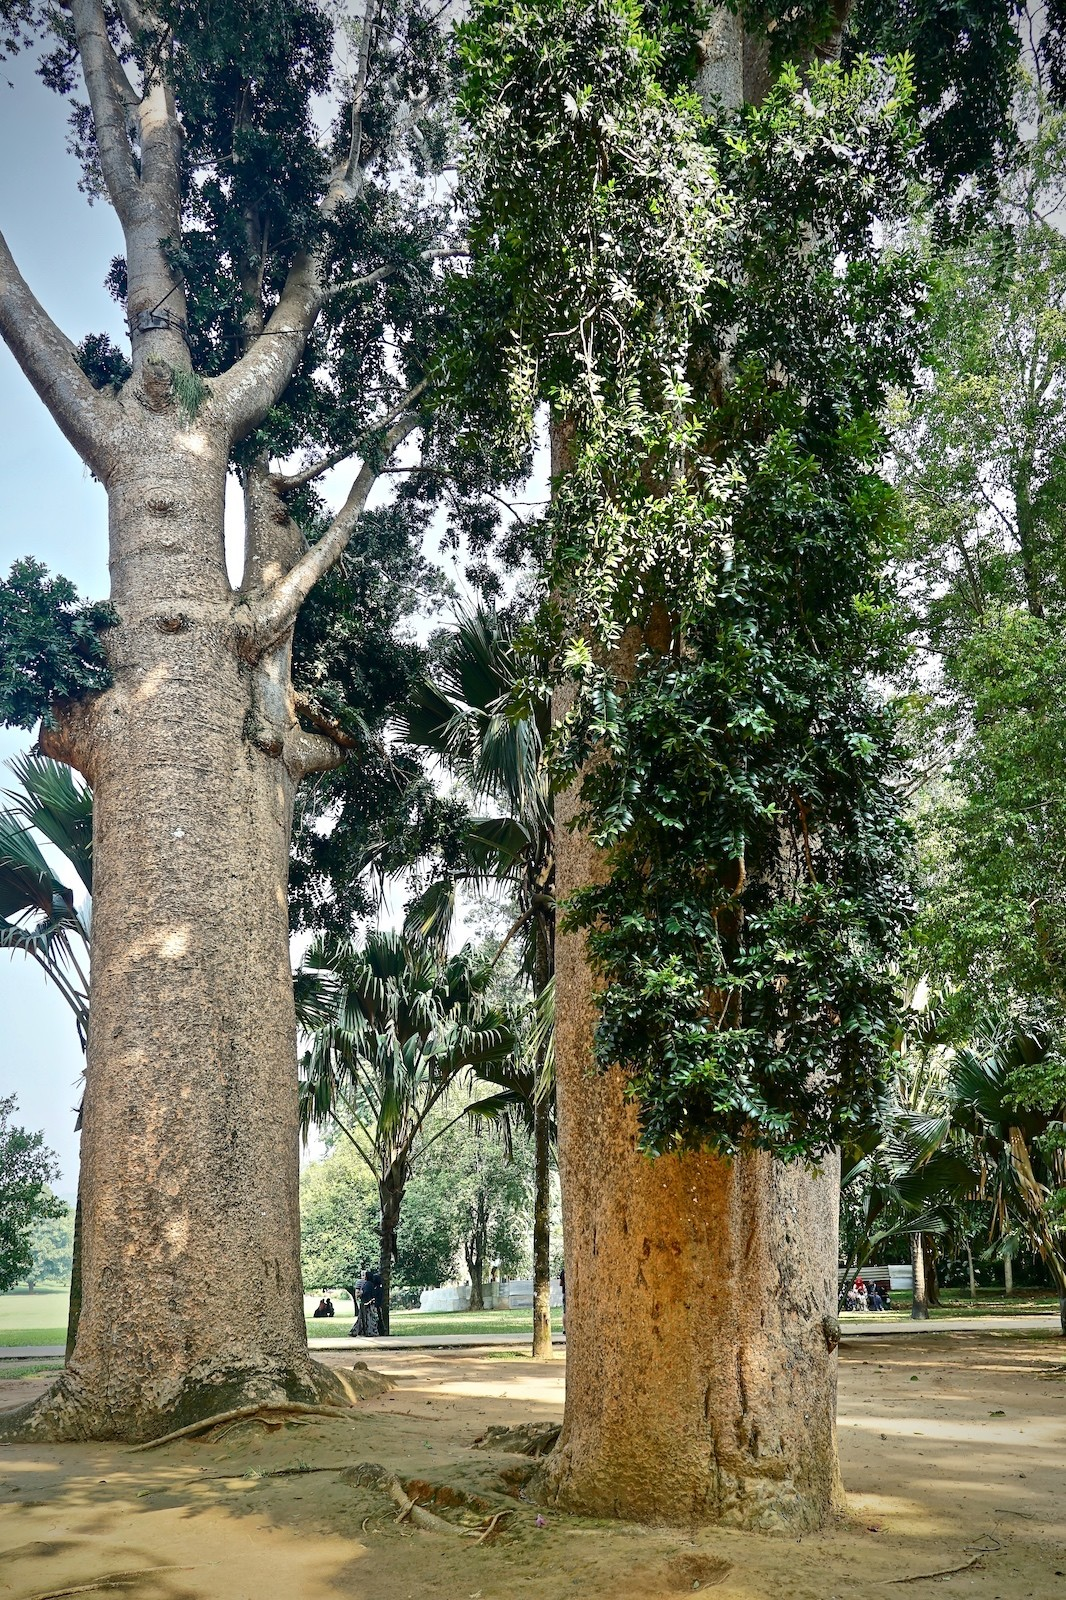 Wuchtiger Baumbestand im Royal Botanical Garden von Peradeniya, Sri Lanka